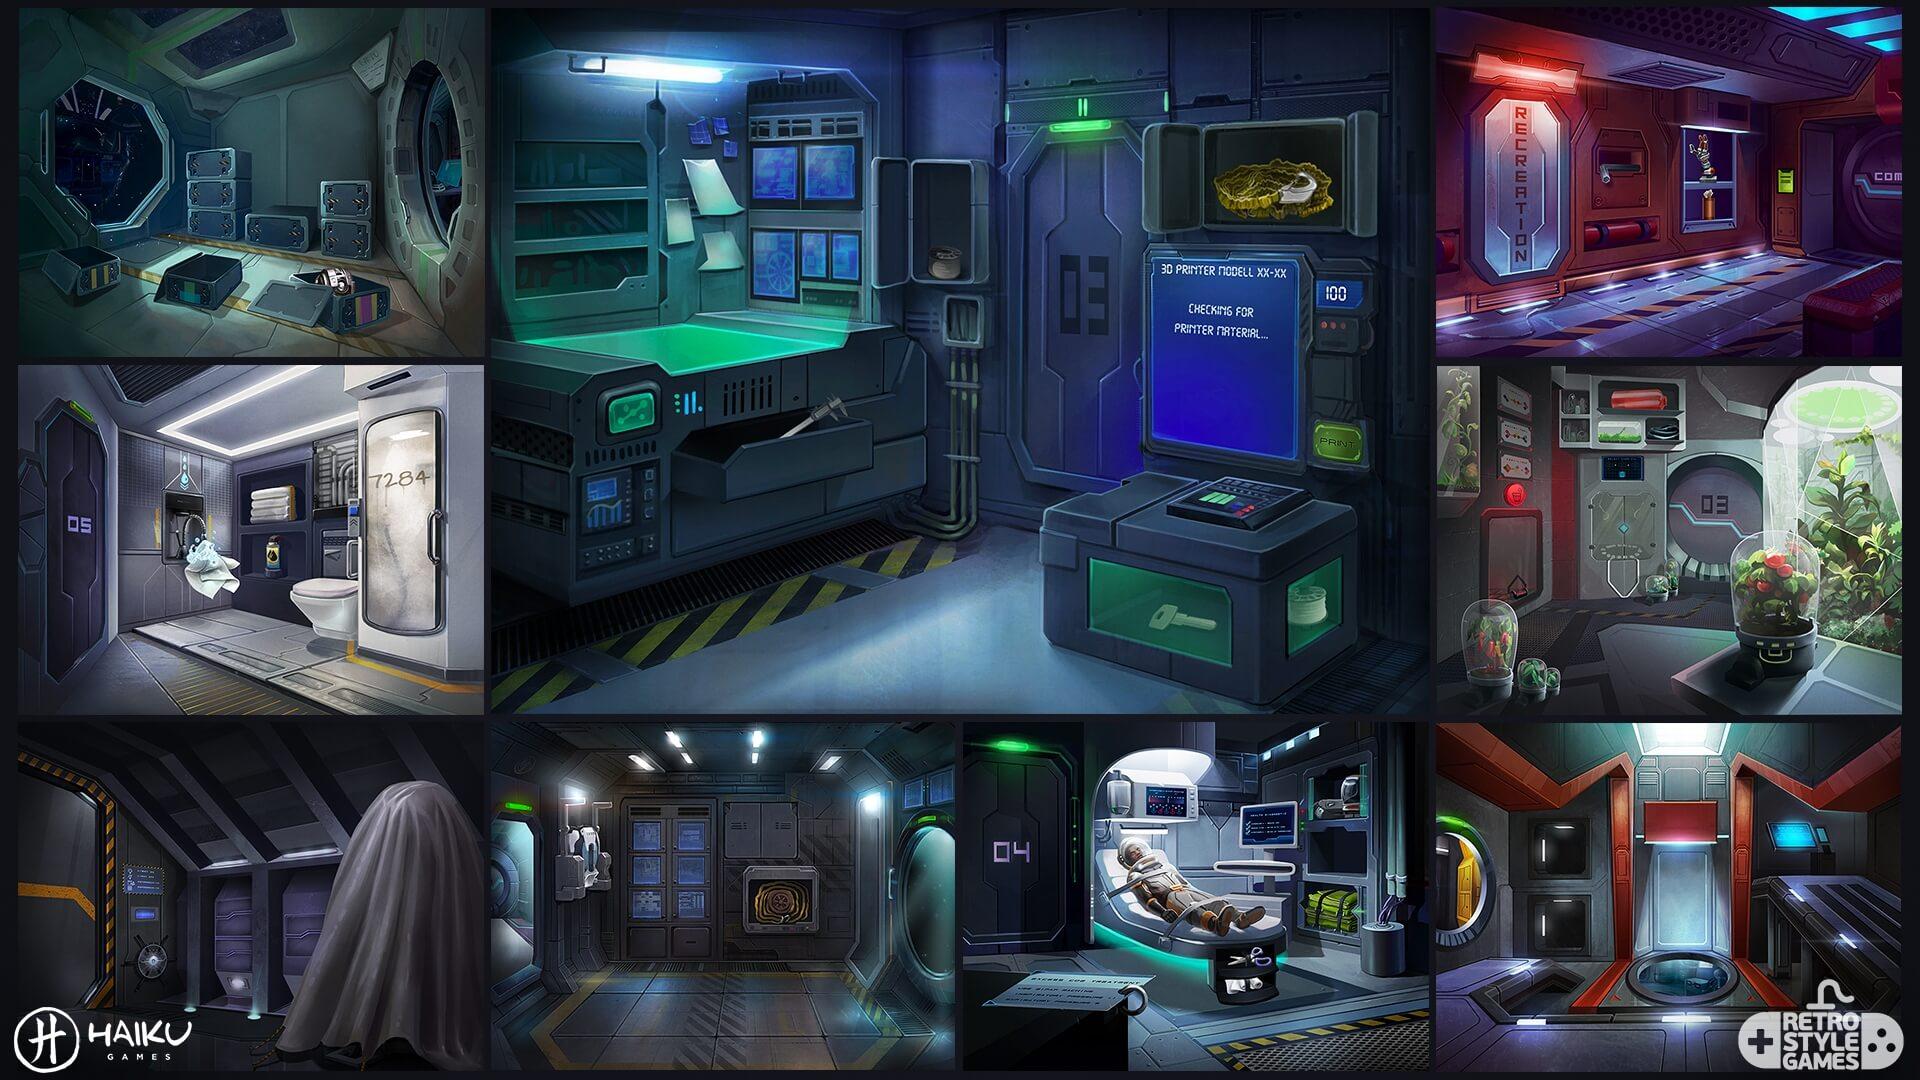 space crisis full art sheet1 backgrounds